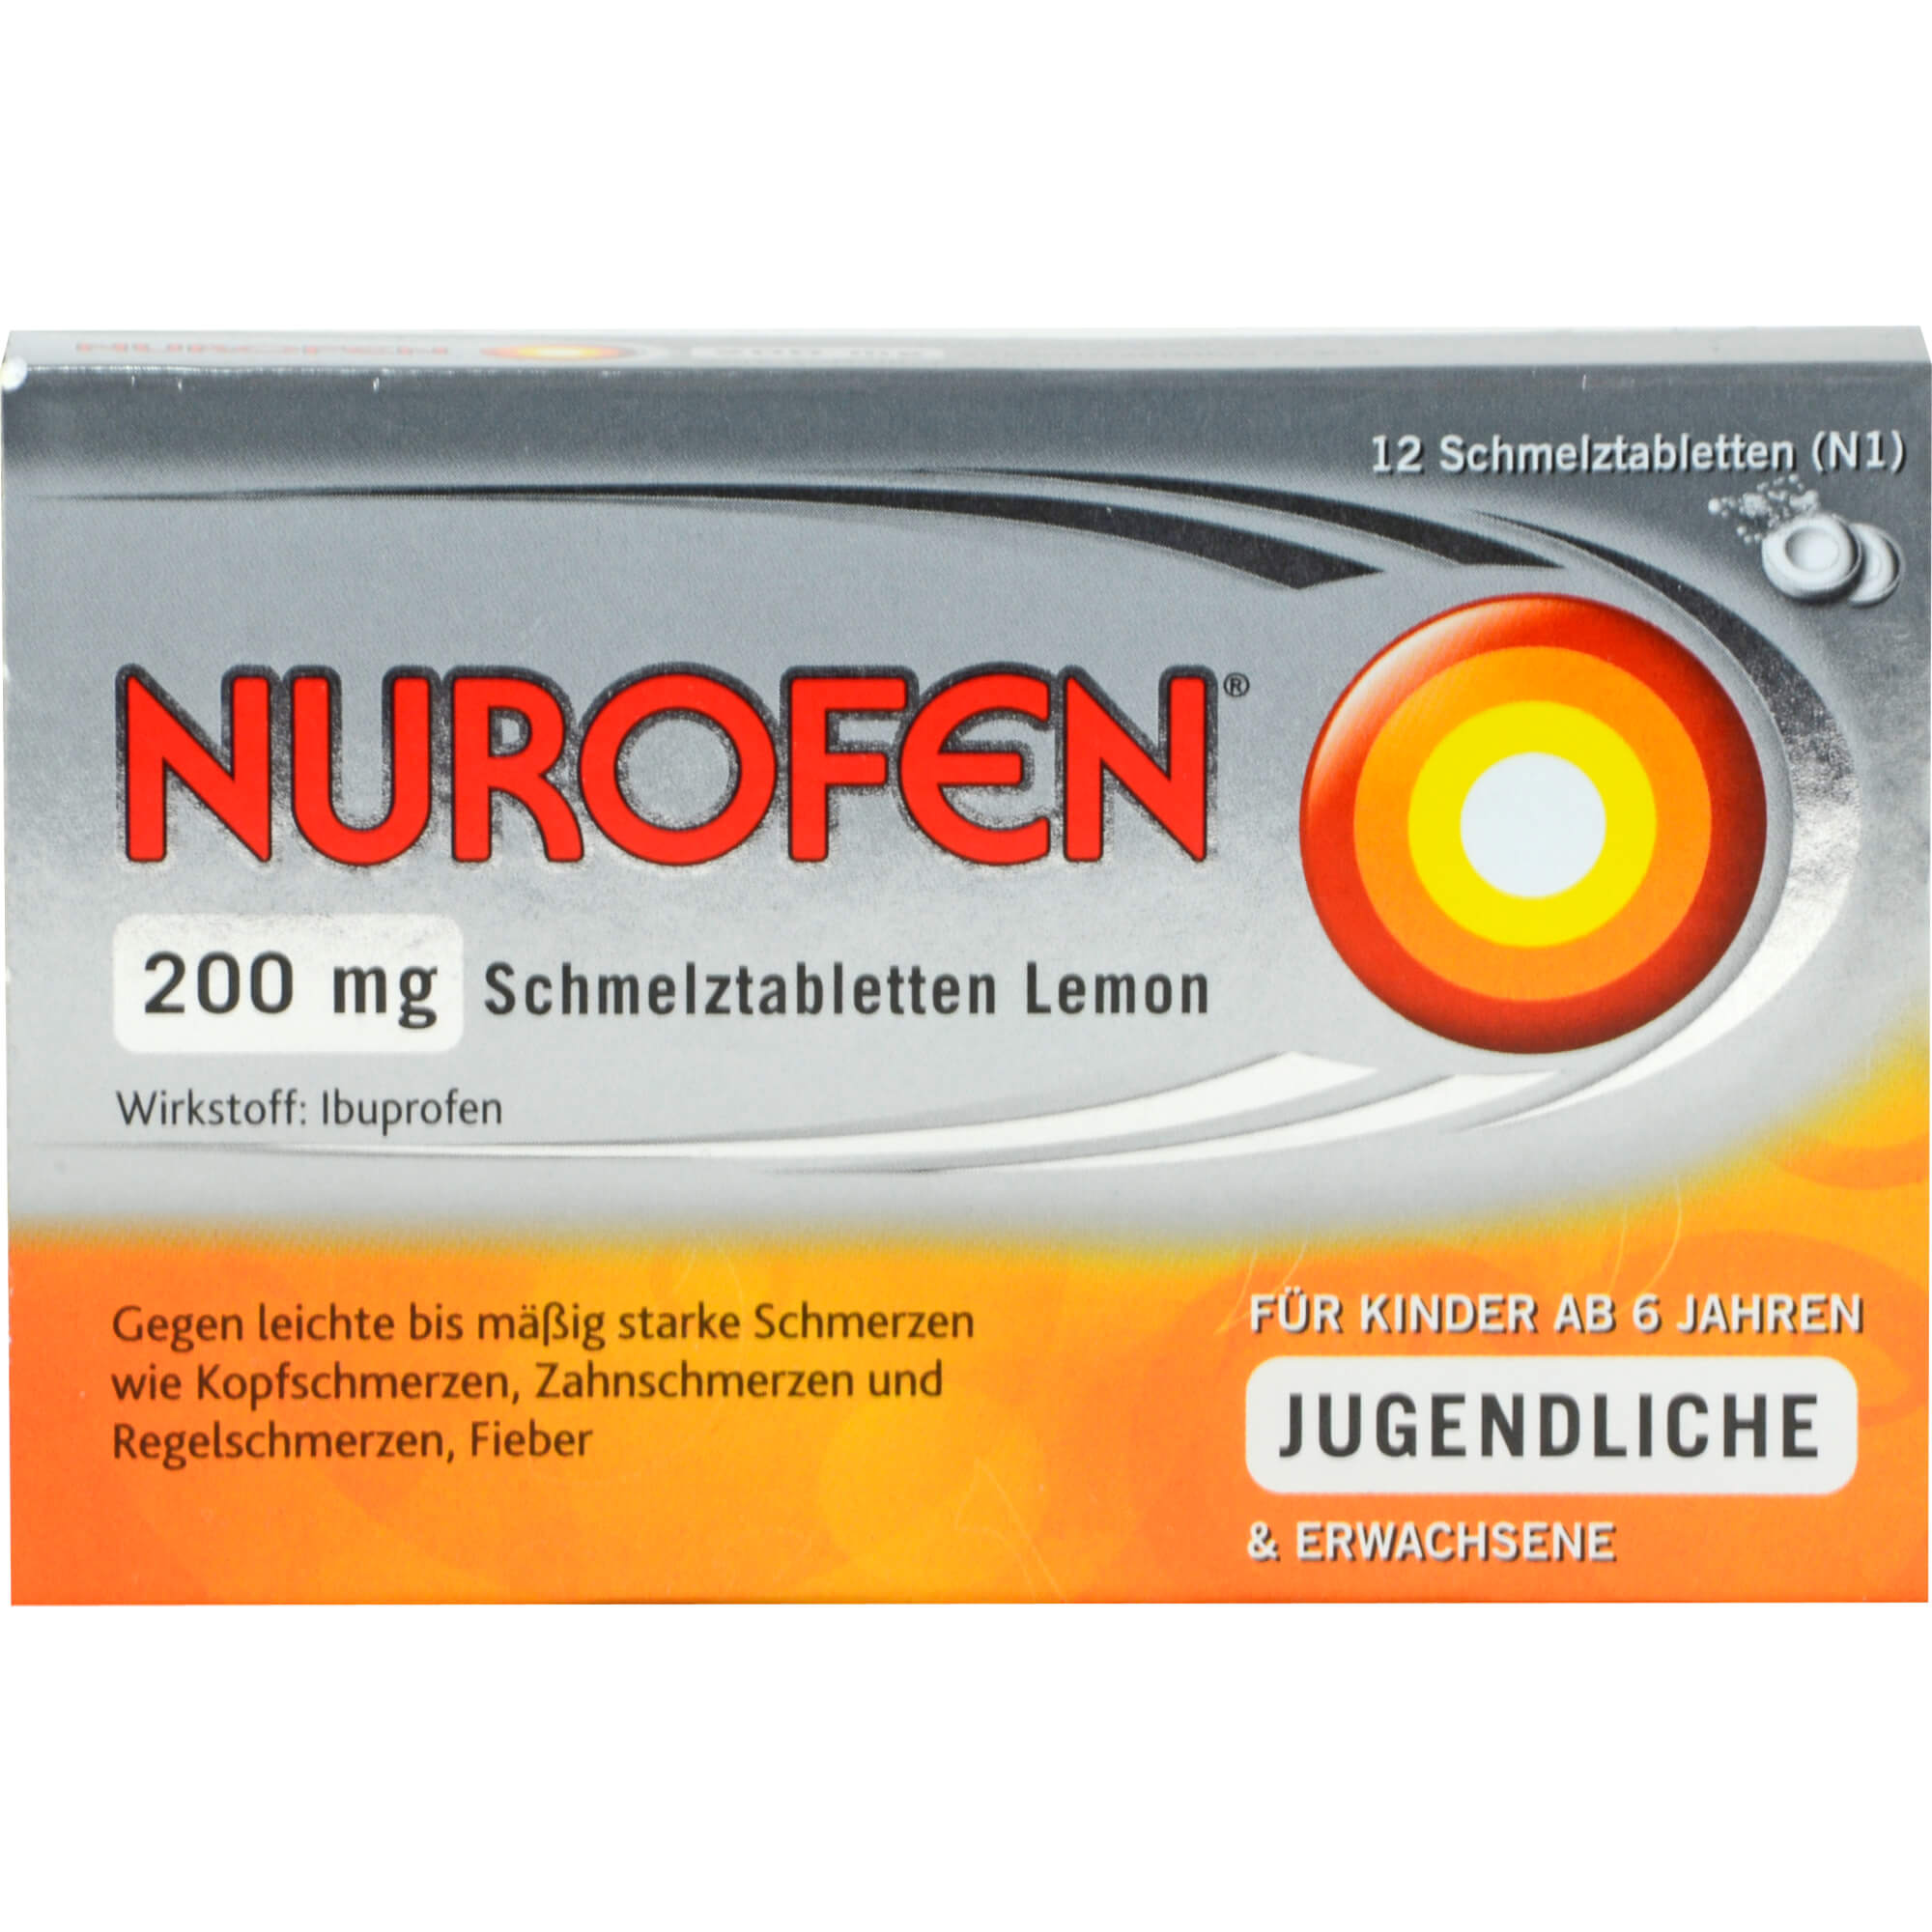 NUROFEN-200-mg-Schmelztabletten-Lemon